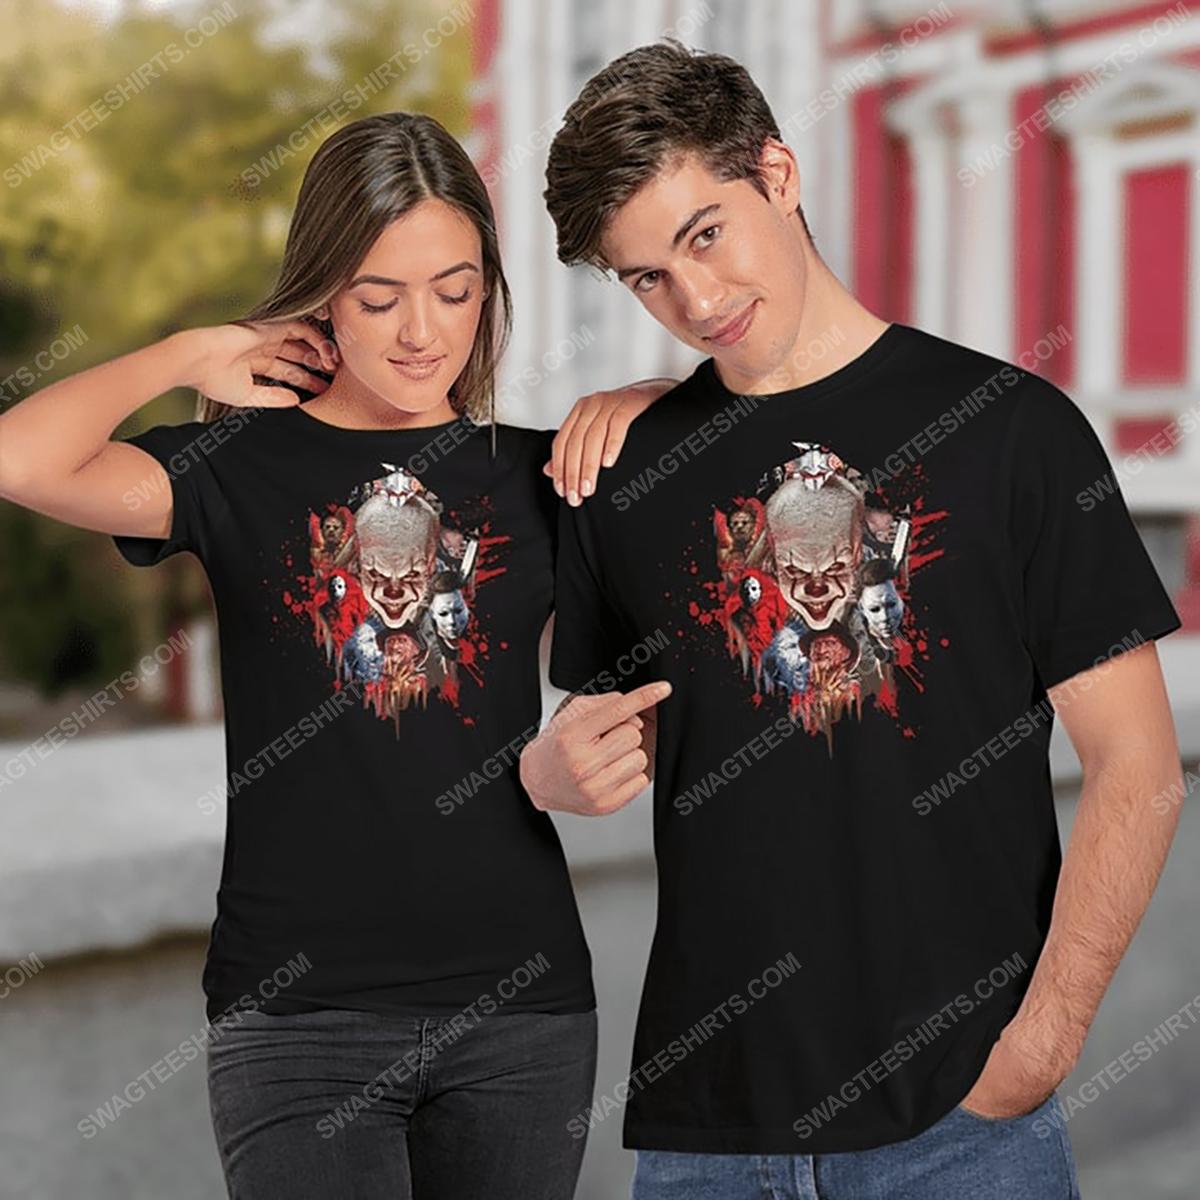 Halloween night horror movie villains with bloody shirt 2(1)